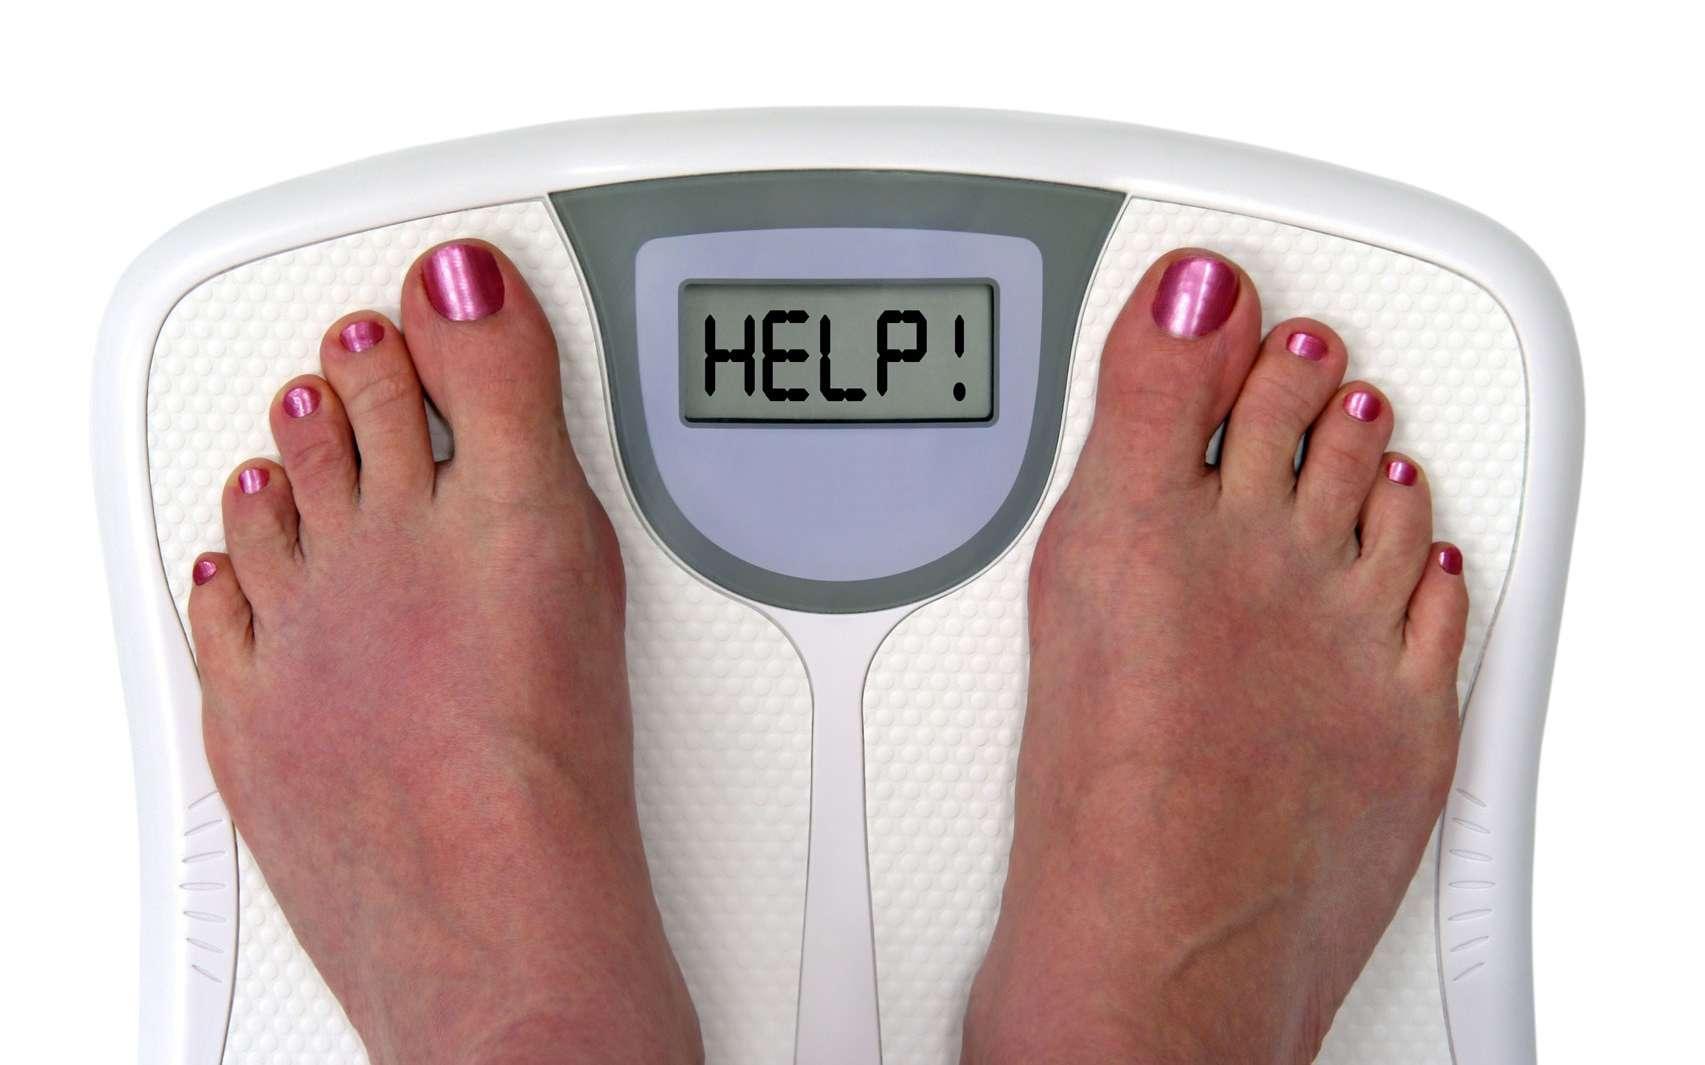 Régime Atkins trop restrictif ? - Source : © Amy Walters - Fotolia.com